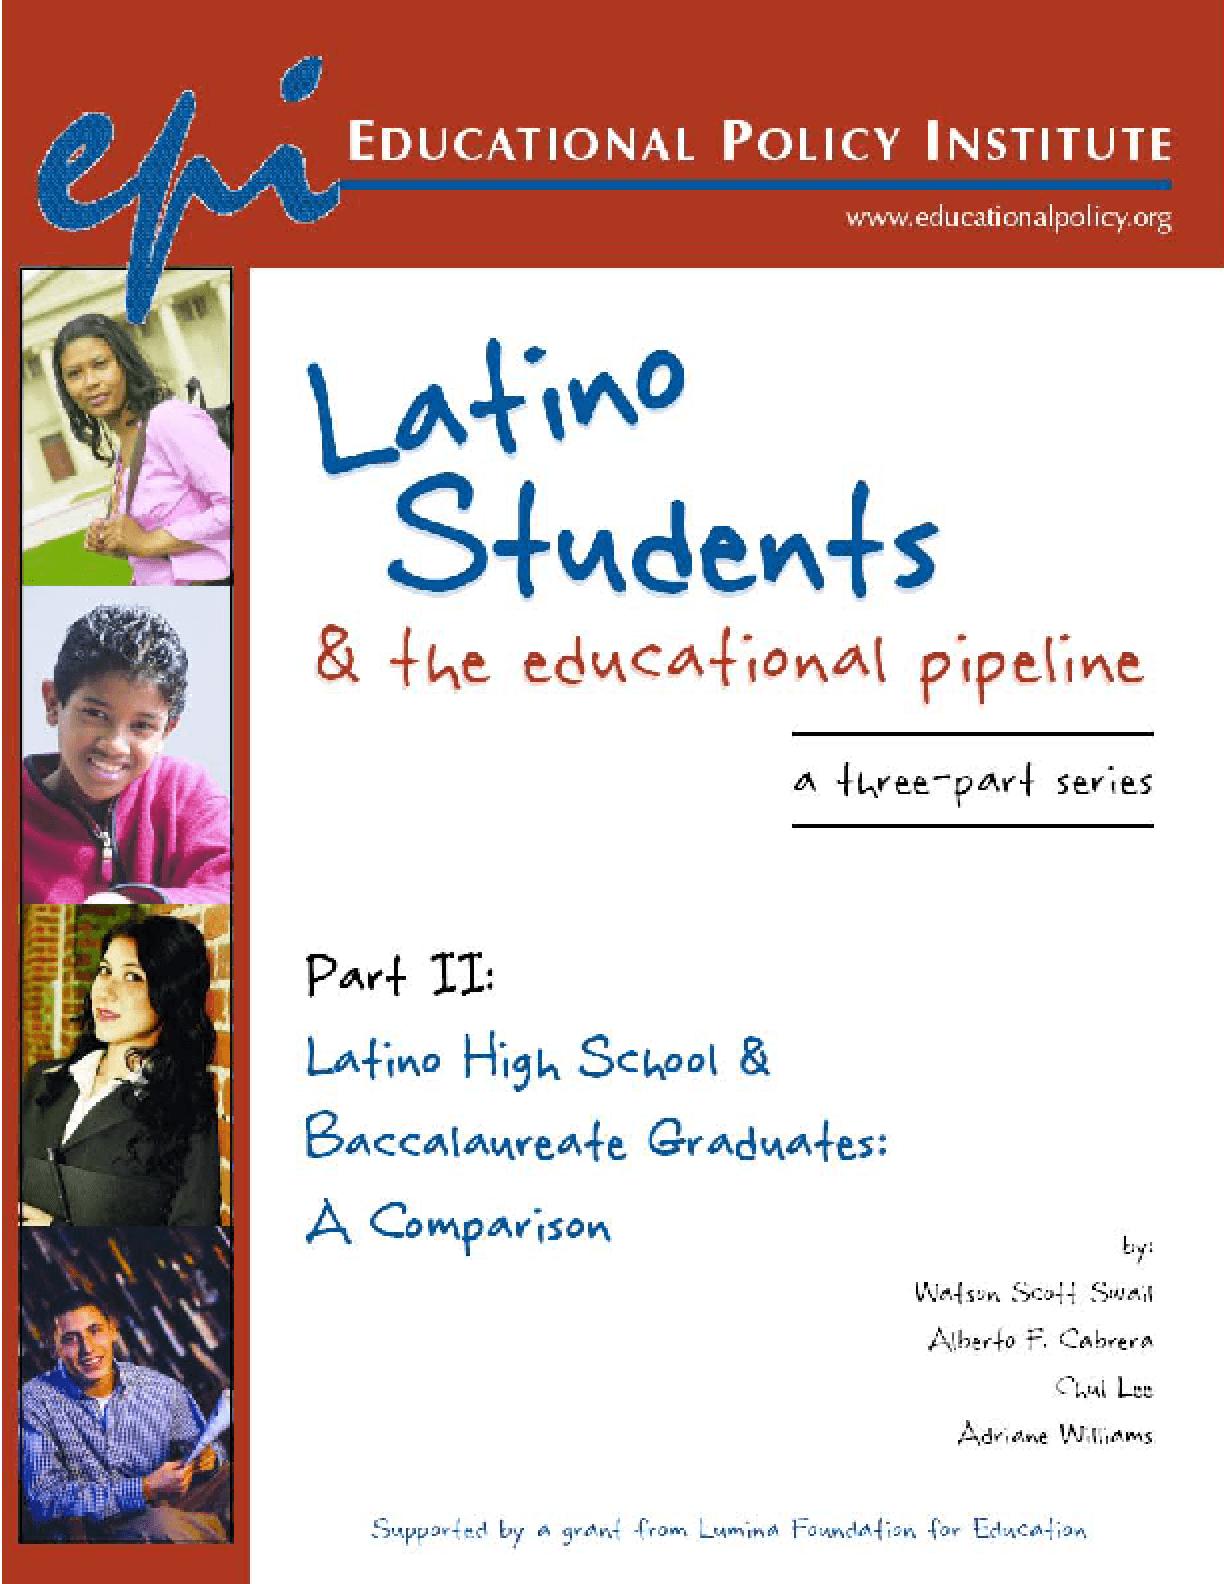 Latino High School & Baccalaureate Graduates: A Comparison